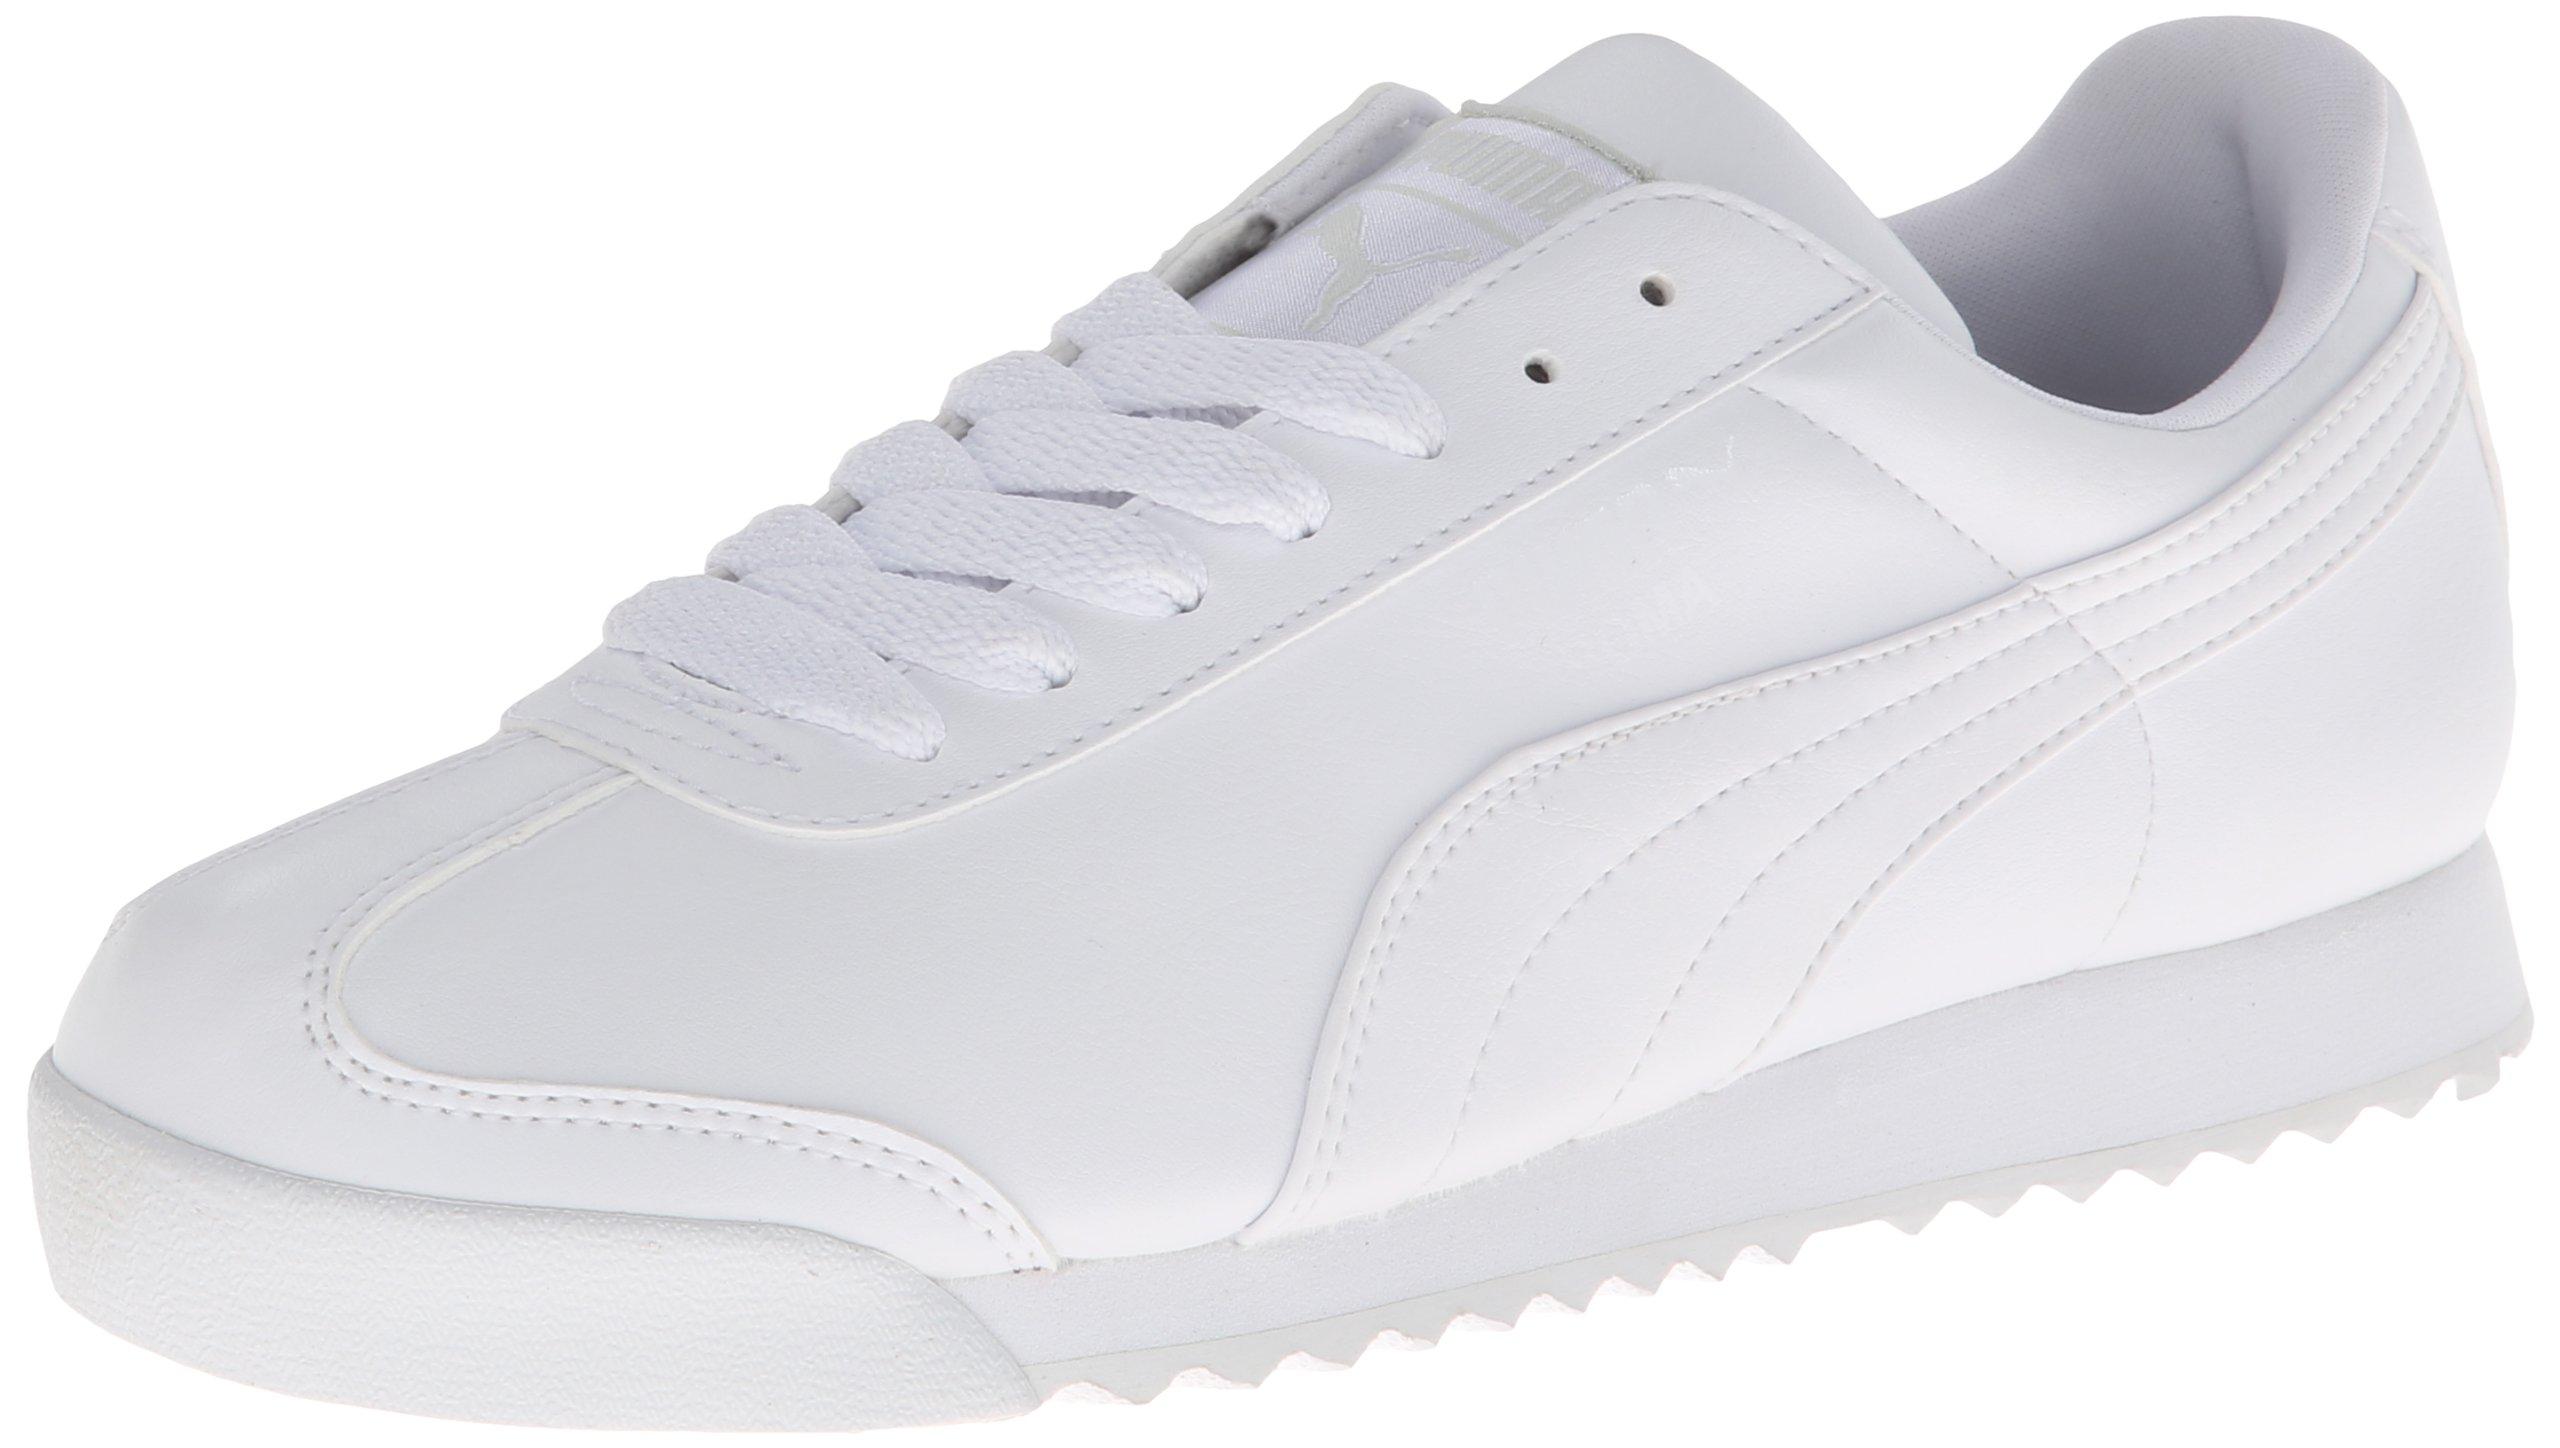 PUMA Women's Roma Basic Classic Sneaker,White/Light Gray,7.5 B US